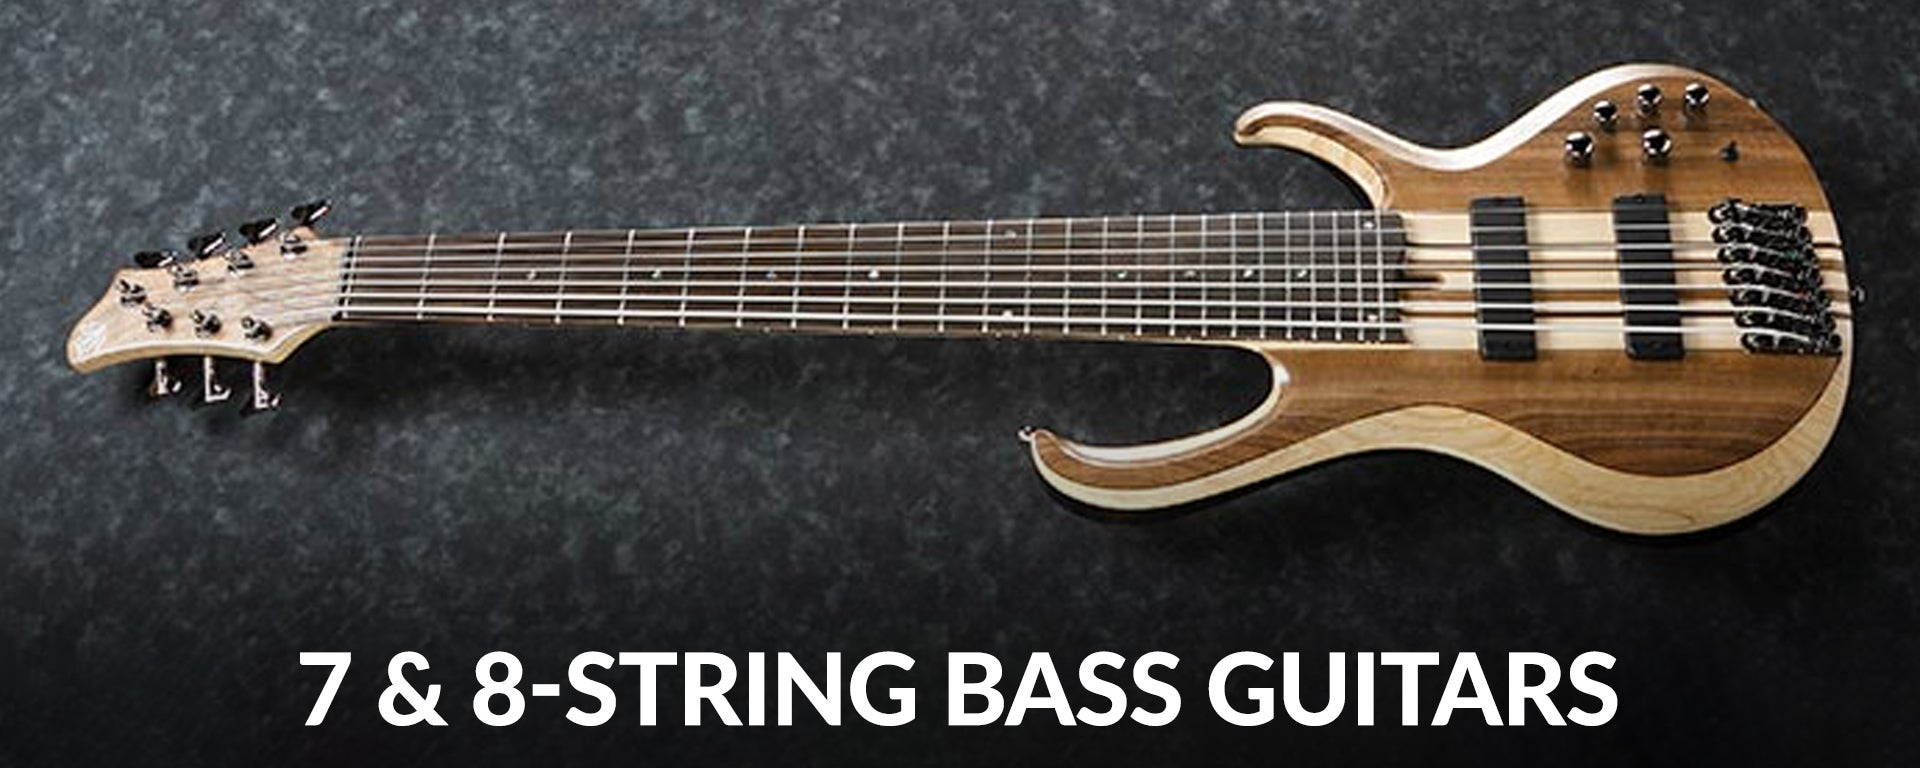 Shop 7 and 8-string electric bass guitars at Sam Ash